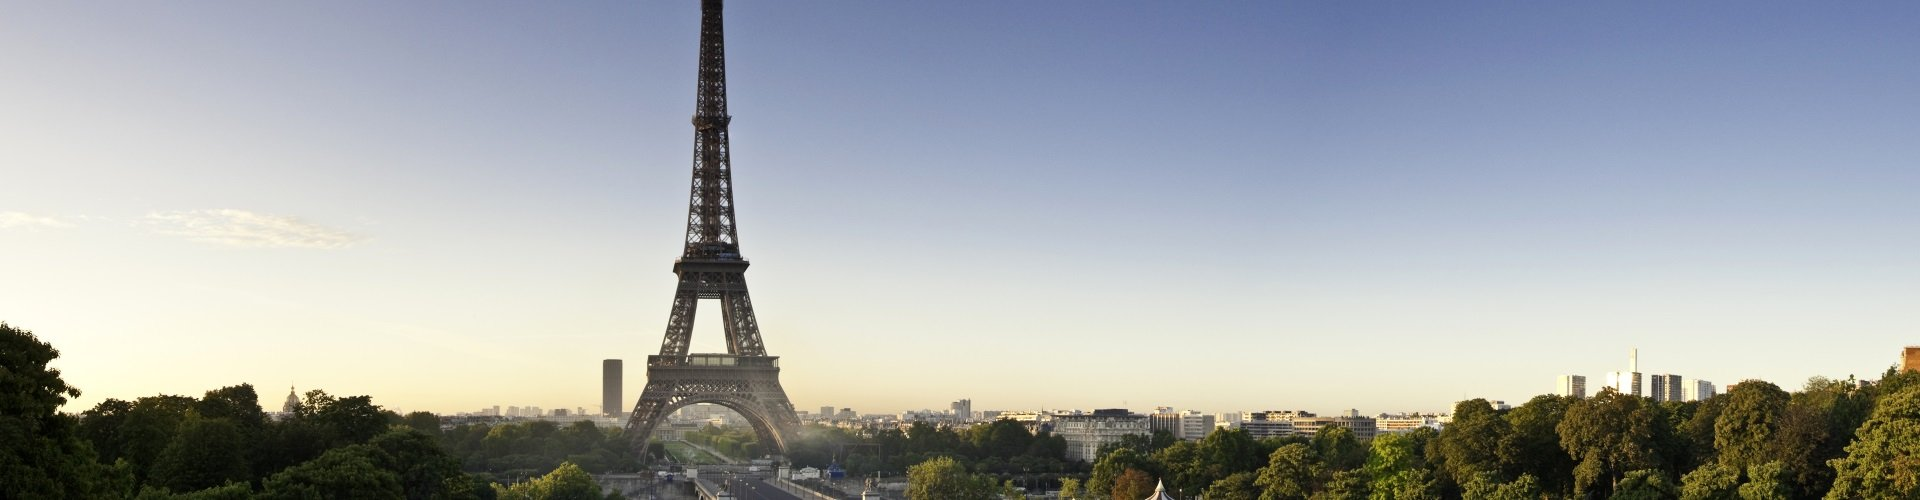 Familienurlaub in Frankreich